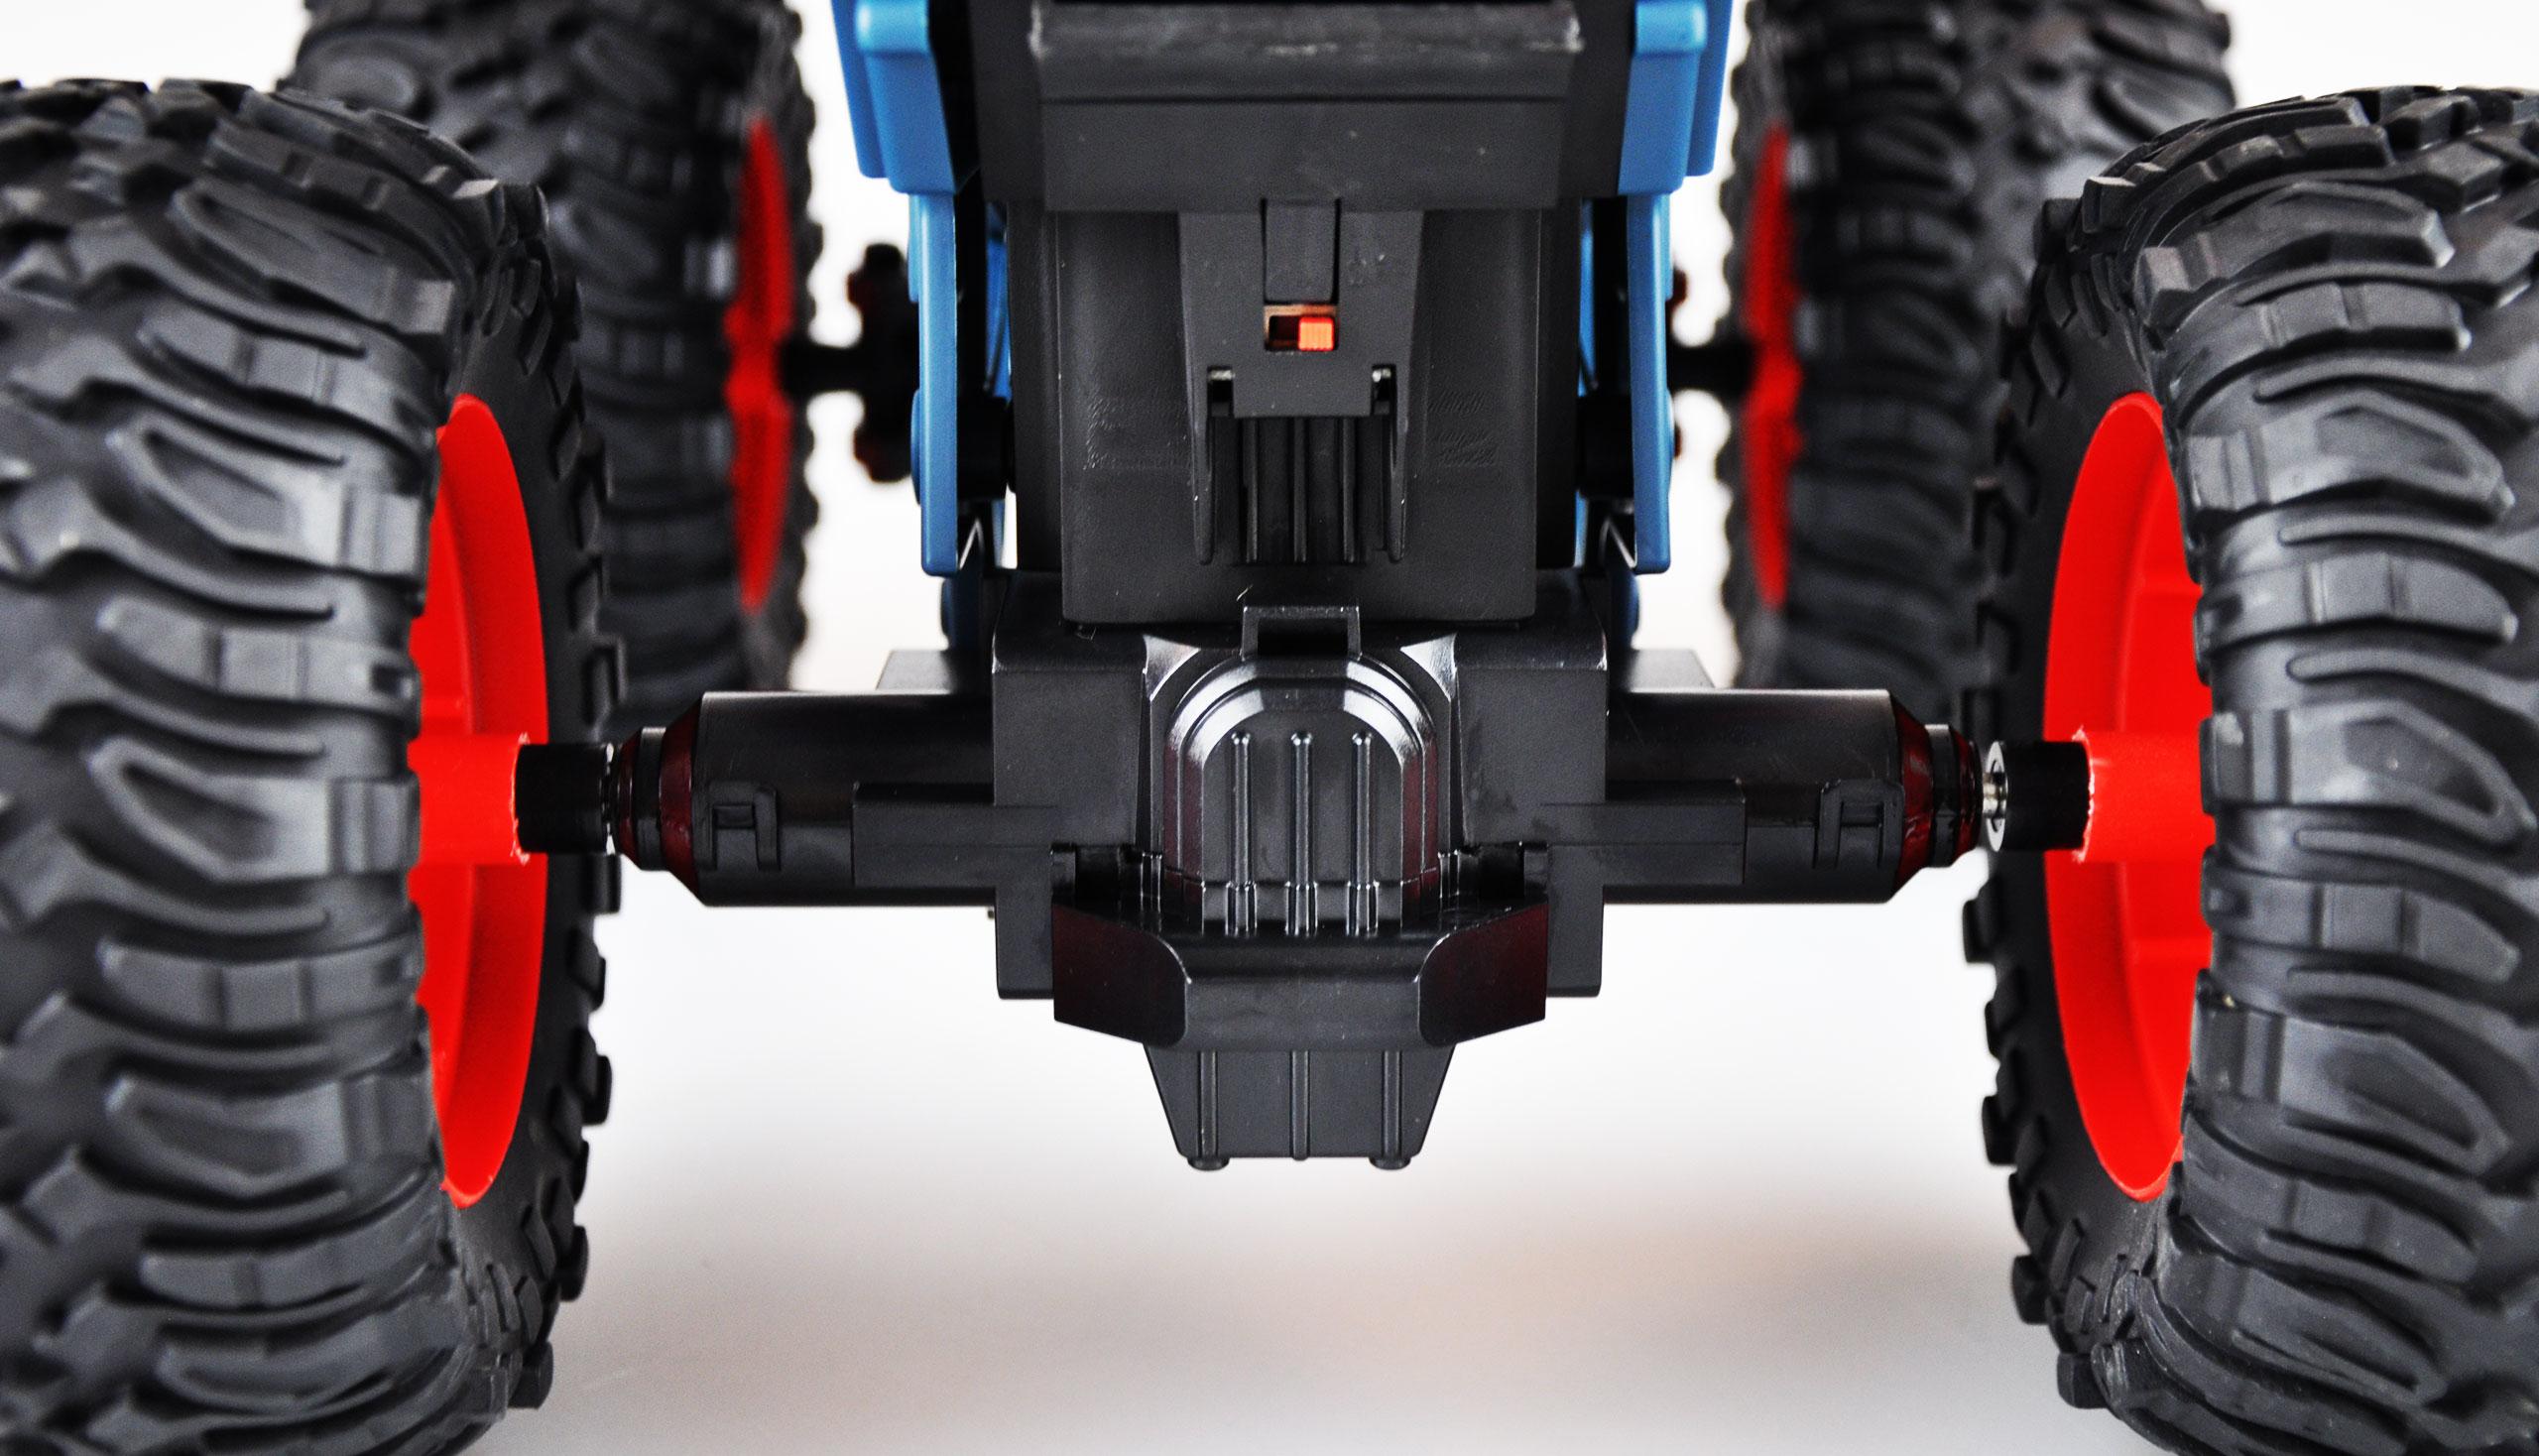 Amewi Command Big - Monstertruck - 1:16 - Junge - 14 Jahr(e) - 1200 mAh - 1,65 kg